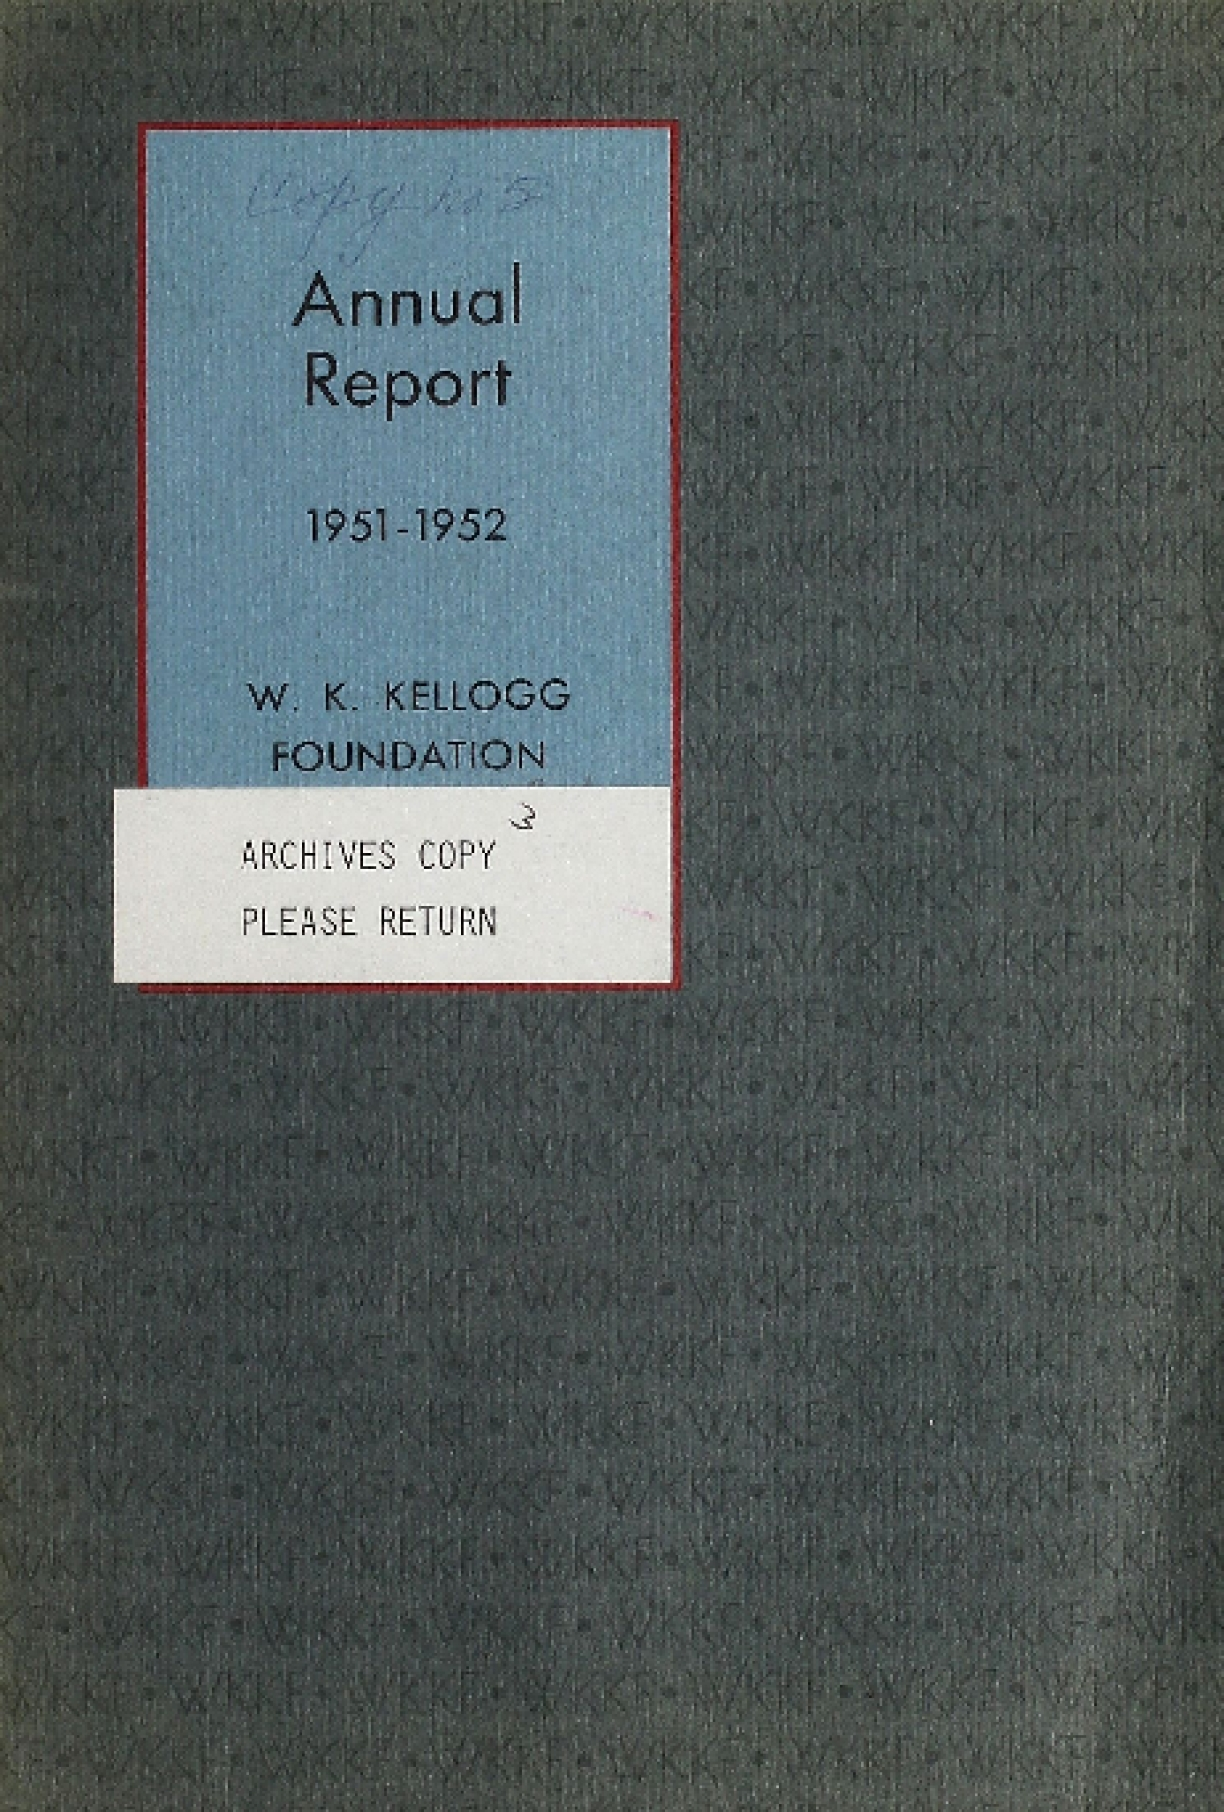 1951-1952 W.K. Kellogg Foundation Annual Report